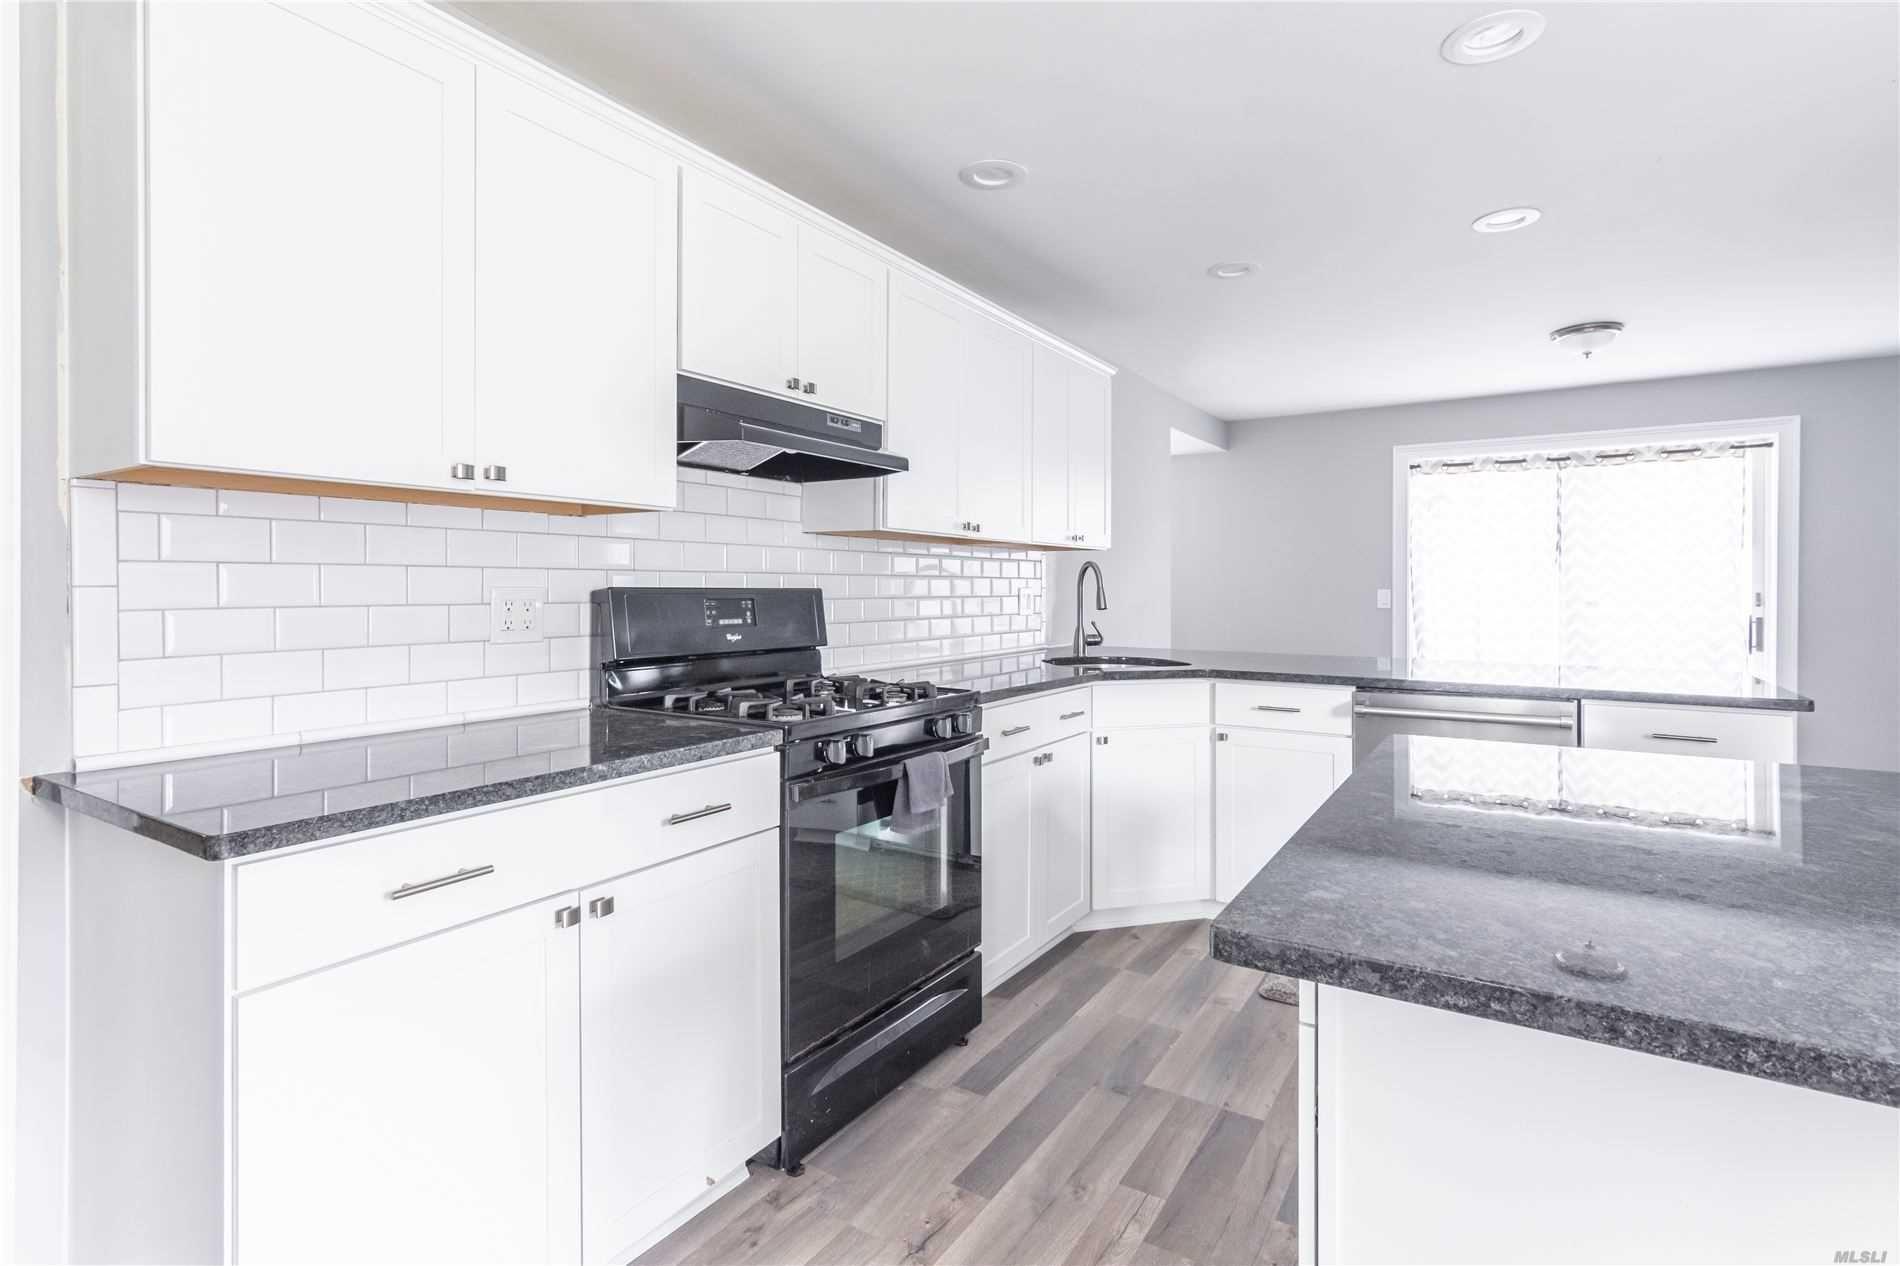 113 Birch Rd, Kings Park, NY 11754 - MLS#: 3240443